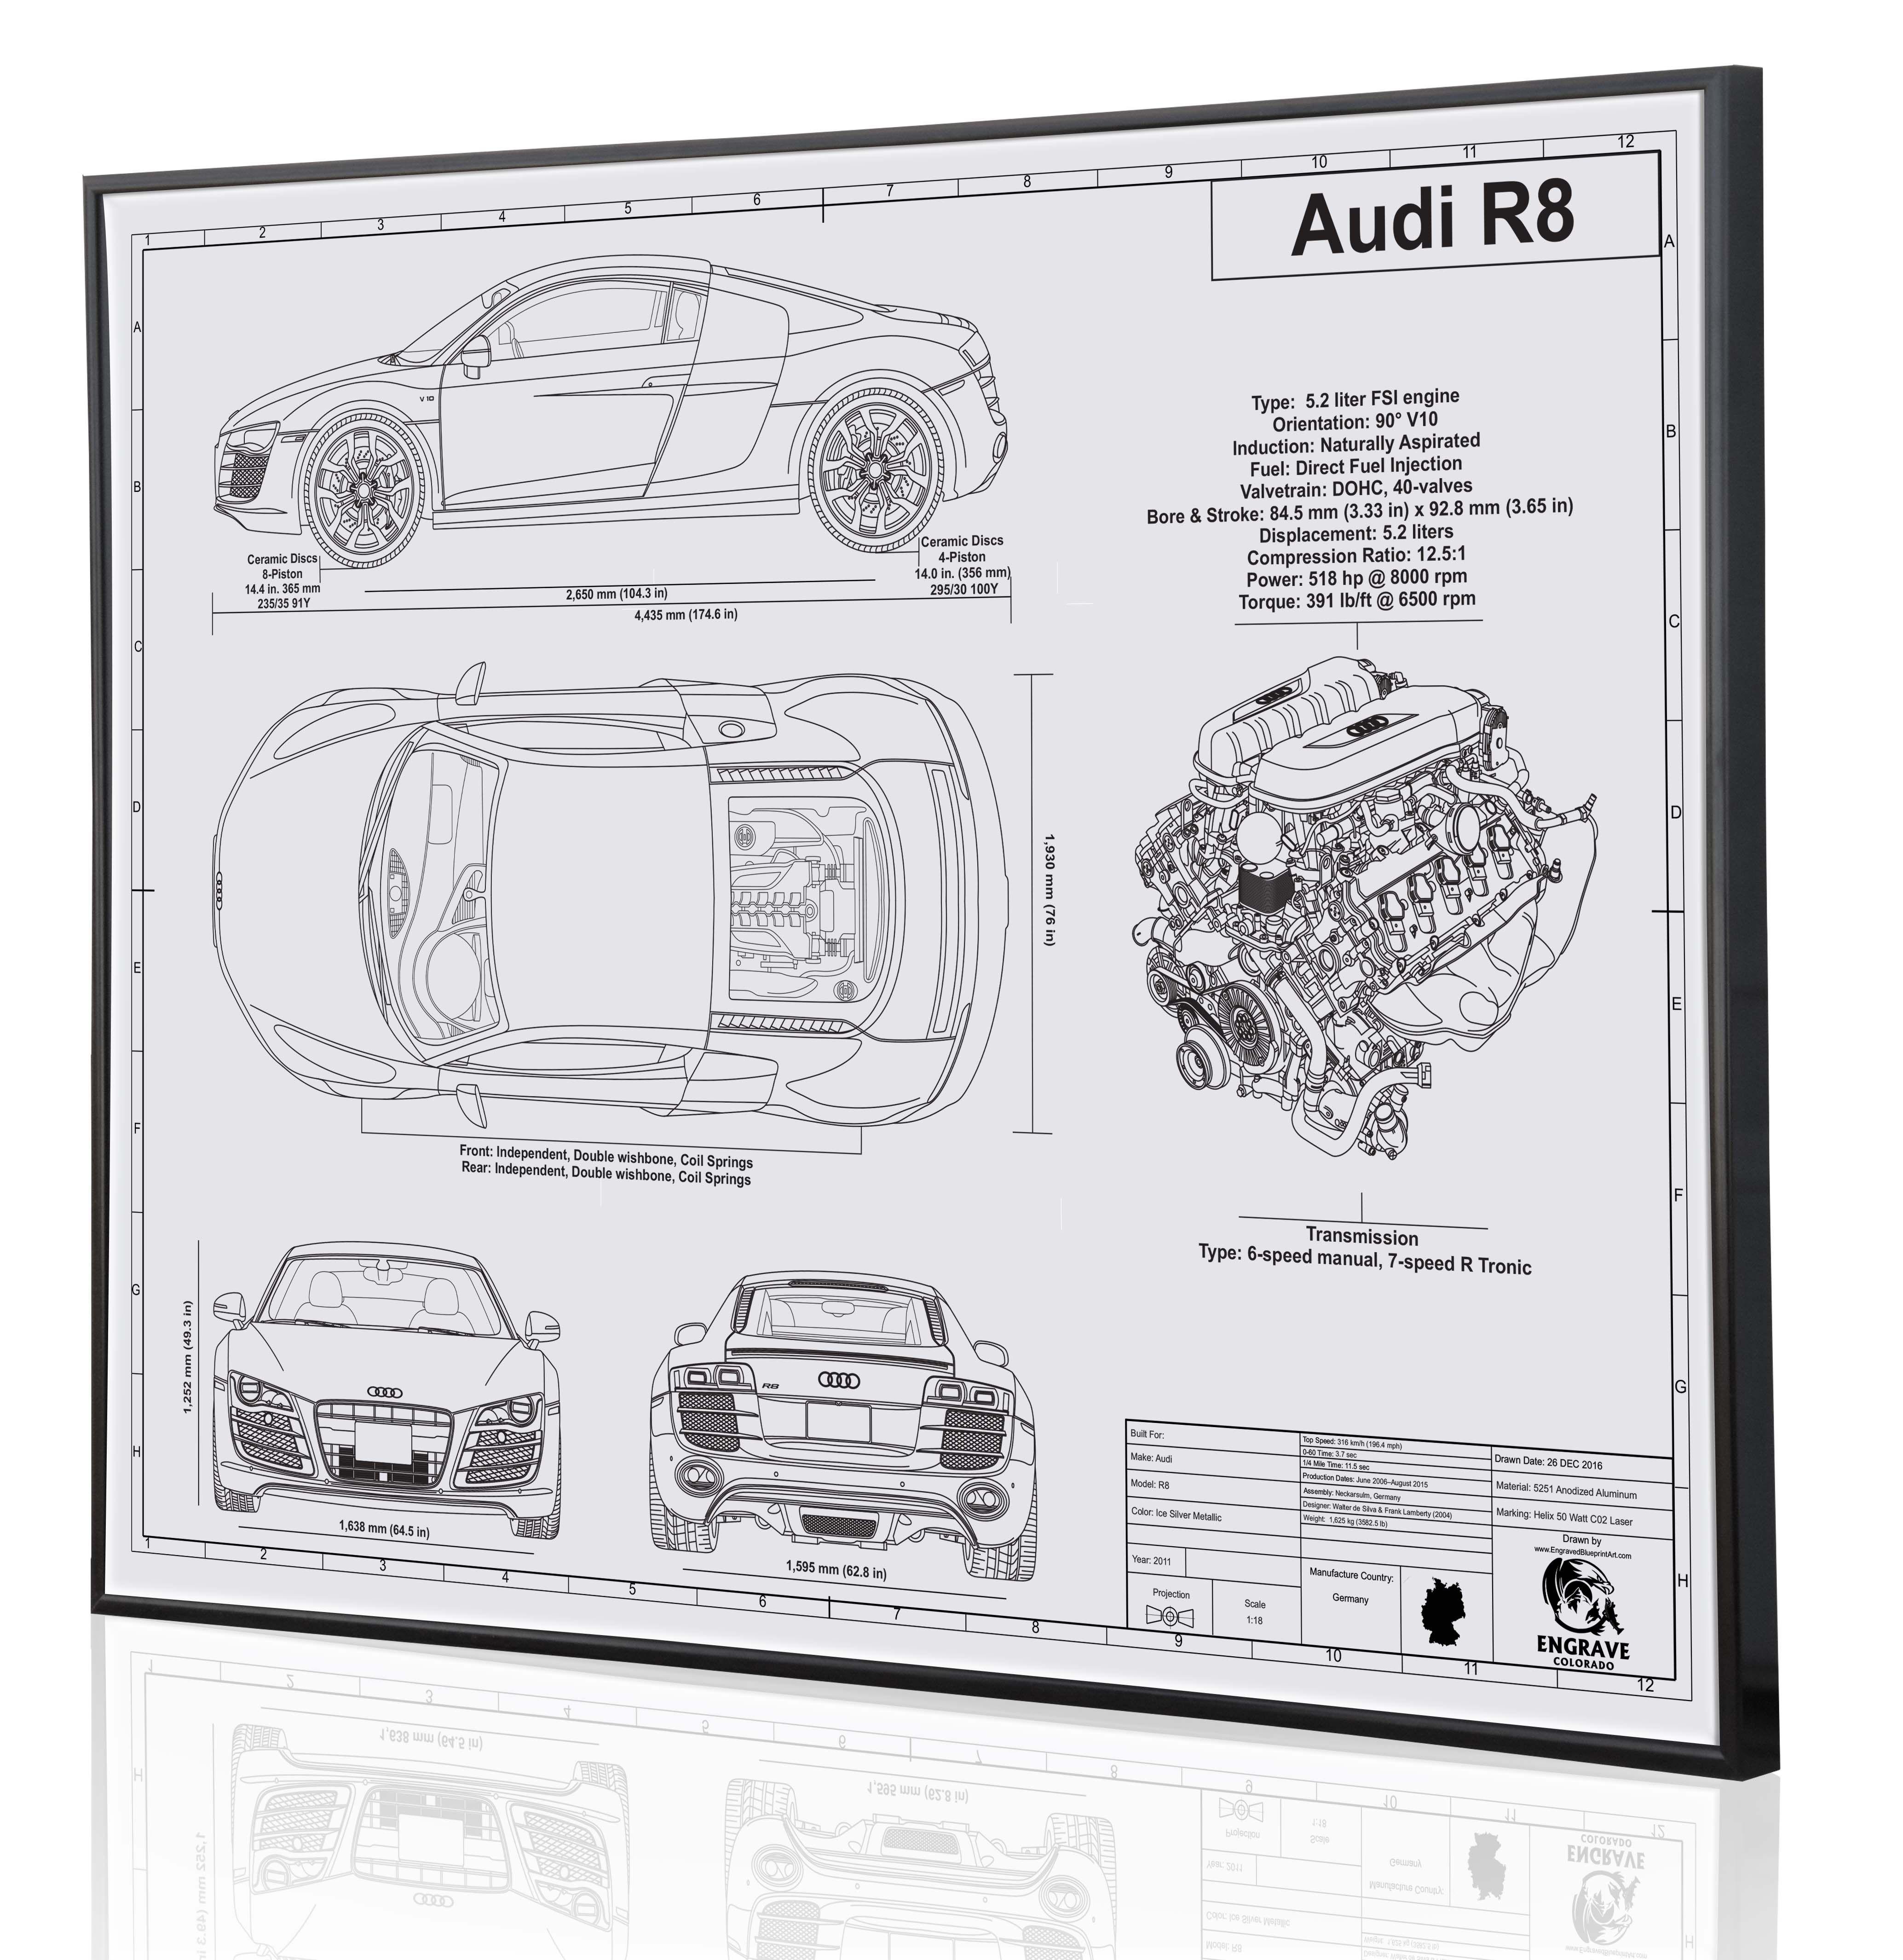 Audi r8 laser engraved blueprint artwork this piece is shown on audi r8 laser engraved blueprint artwork this piece is shown on white acrylic www malvernweather Images